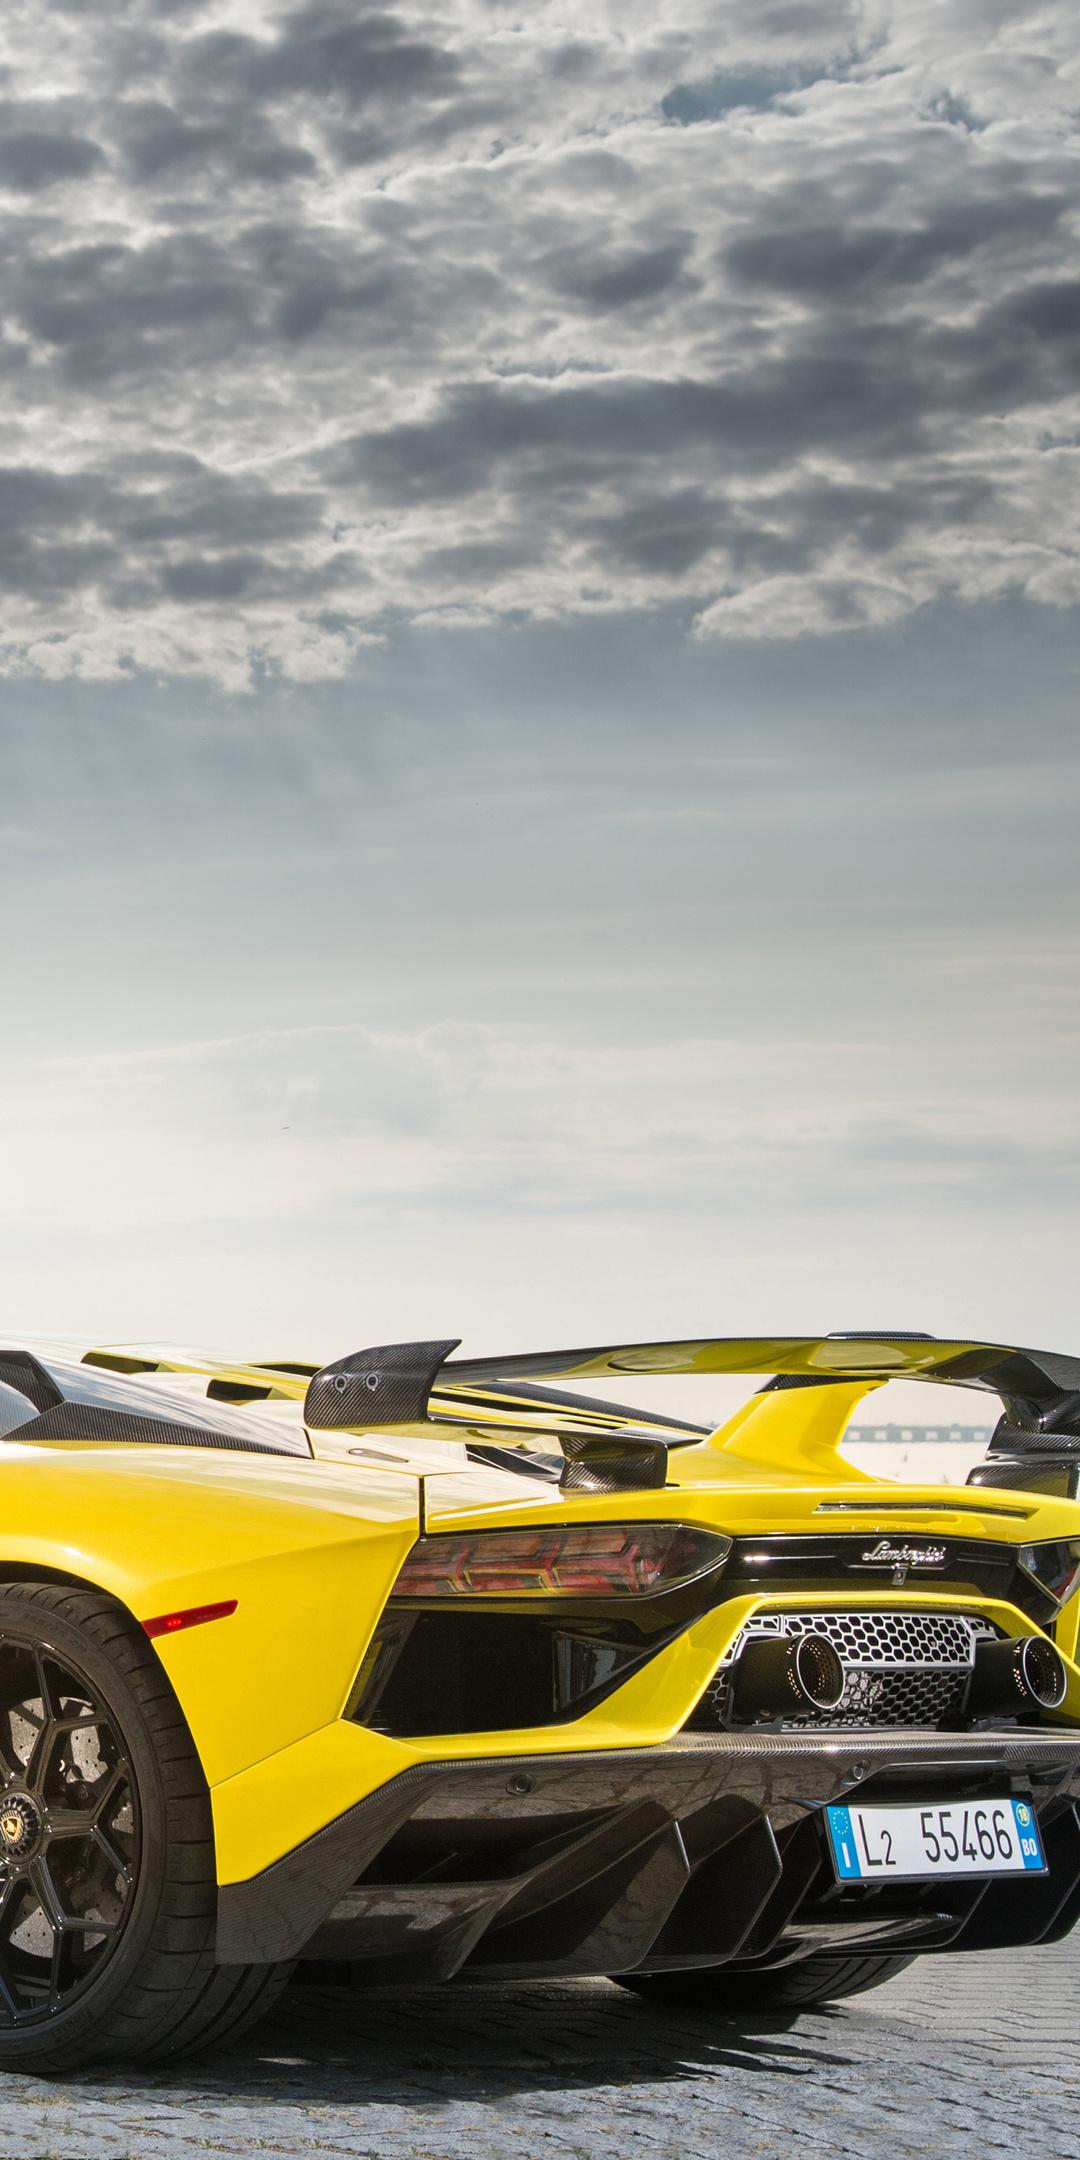 1080x2160 2019 Lamborghini Aventador Svj Rear One Plus 5t Honor 7x